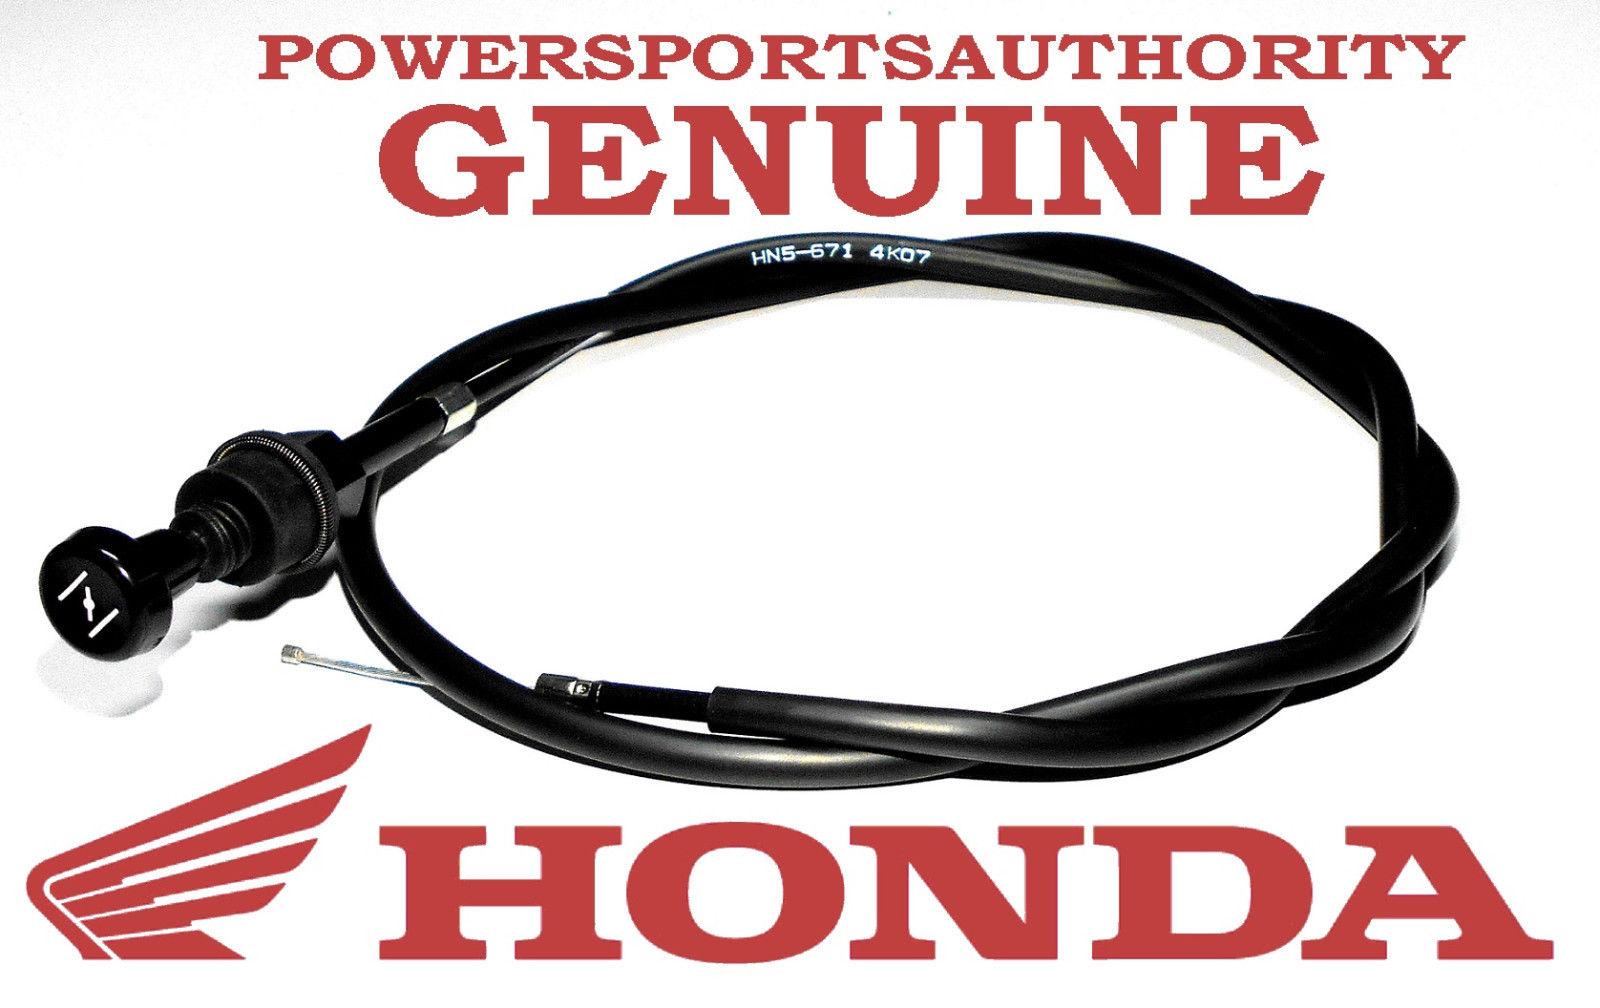 Choke Cable Carb Fit HONDA Rancher 350 OEM Carburetor 2000-2003 17950-HN5-671